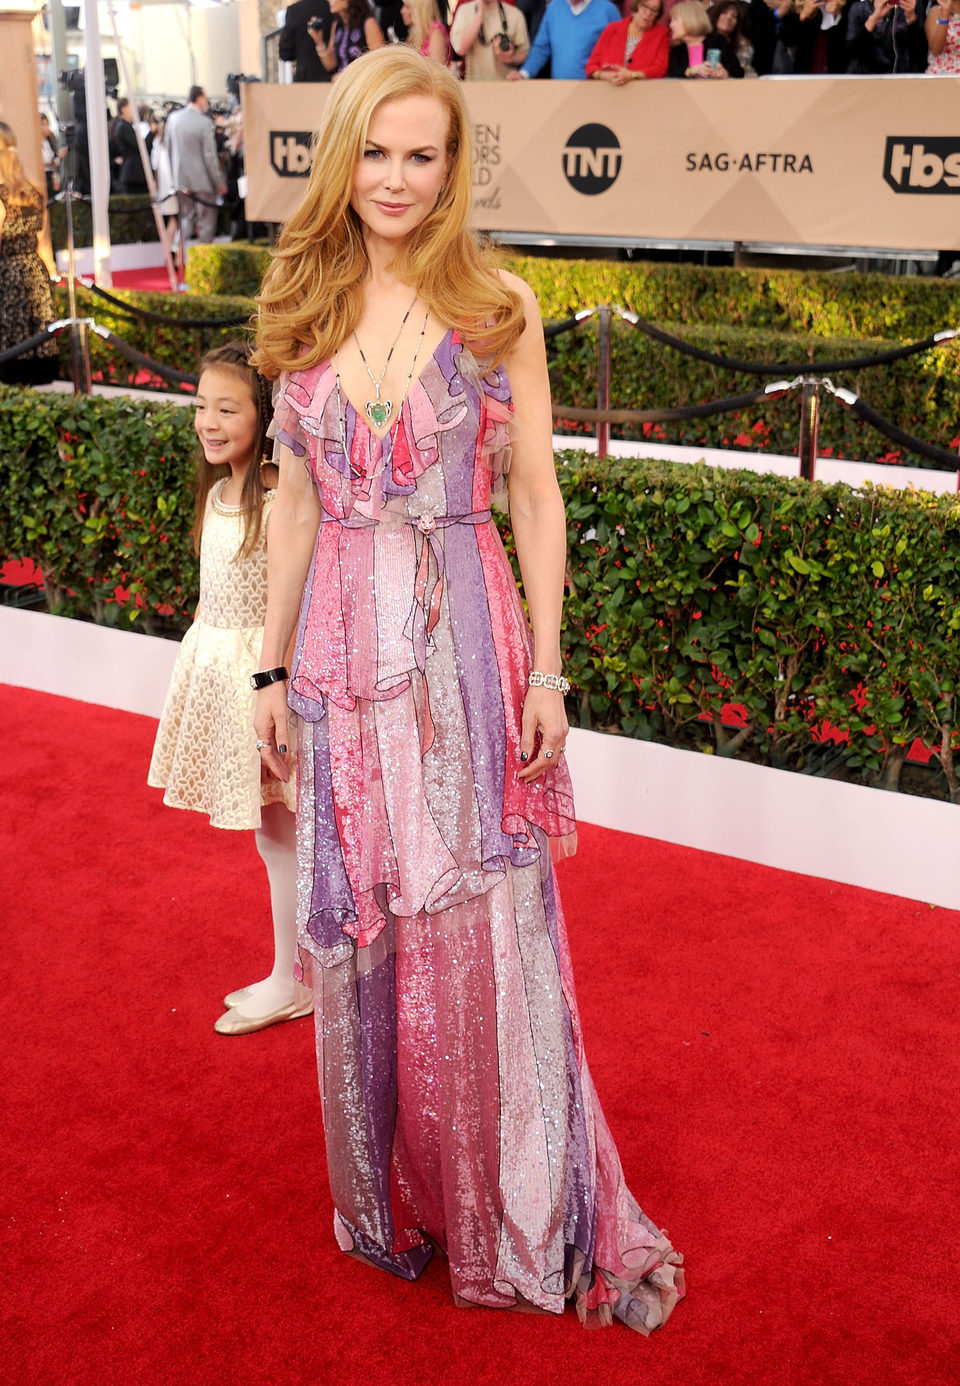 Nicole Kidman at the SAG Awards 2016 red carpet